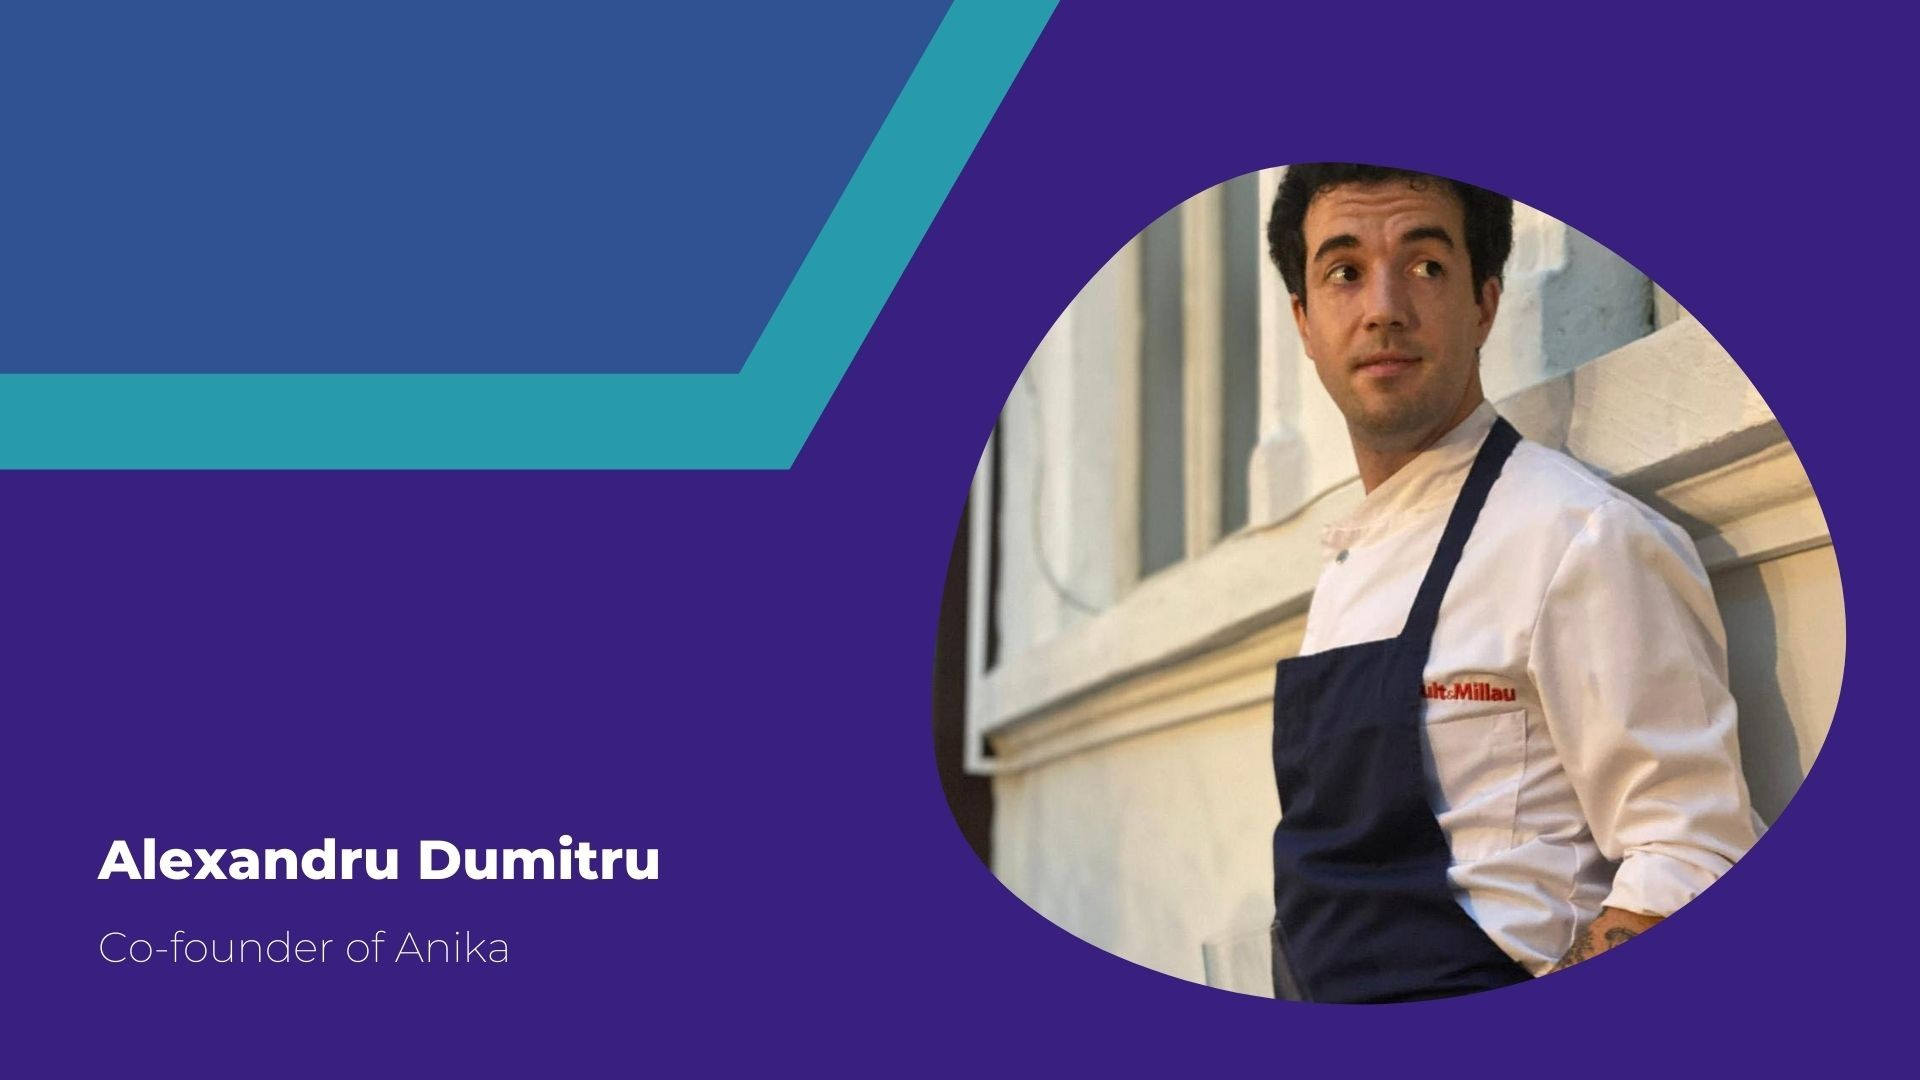 Alexandru Dumitru - Anika